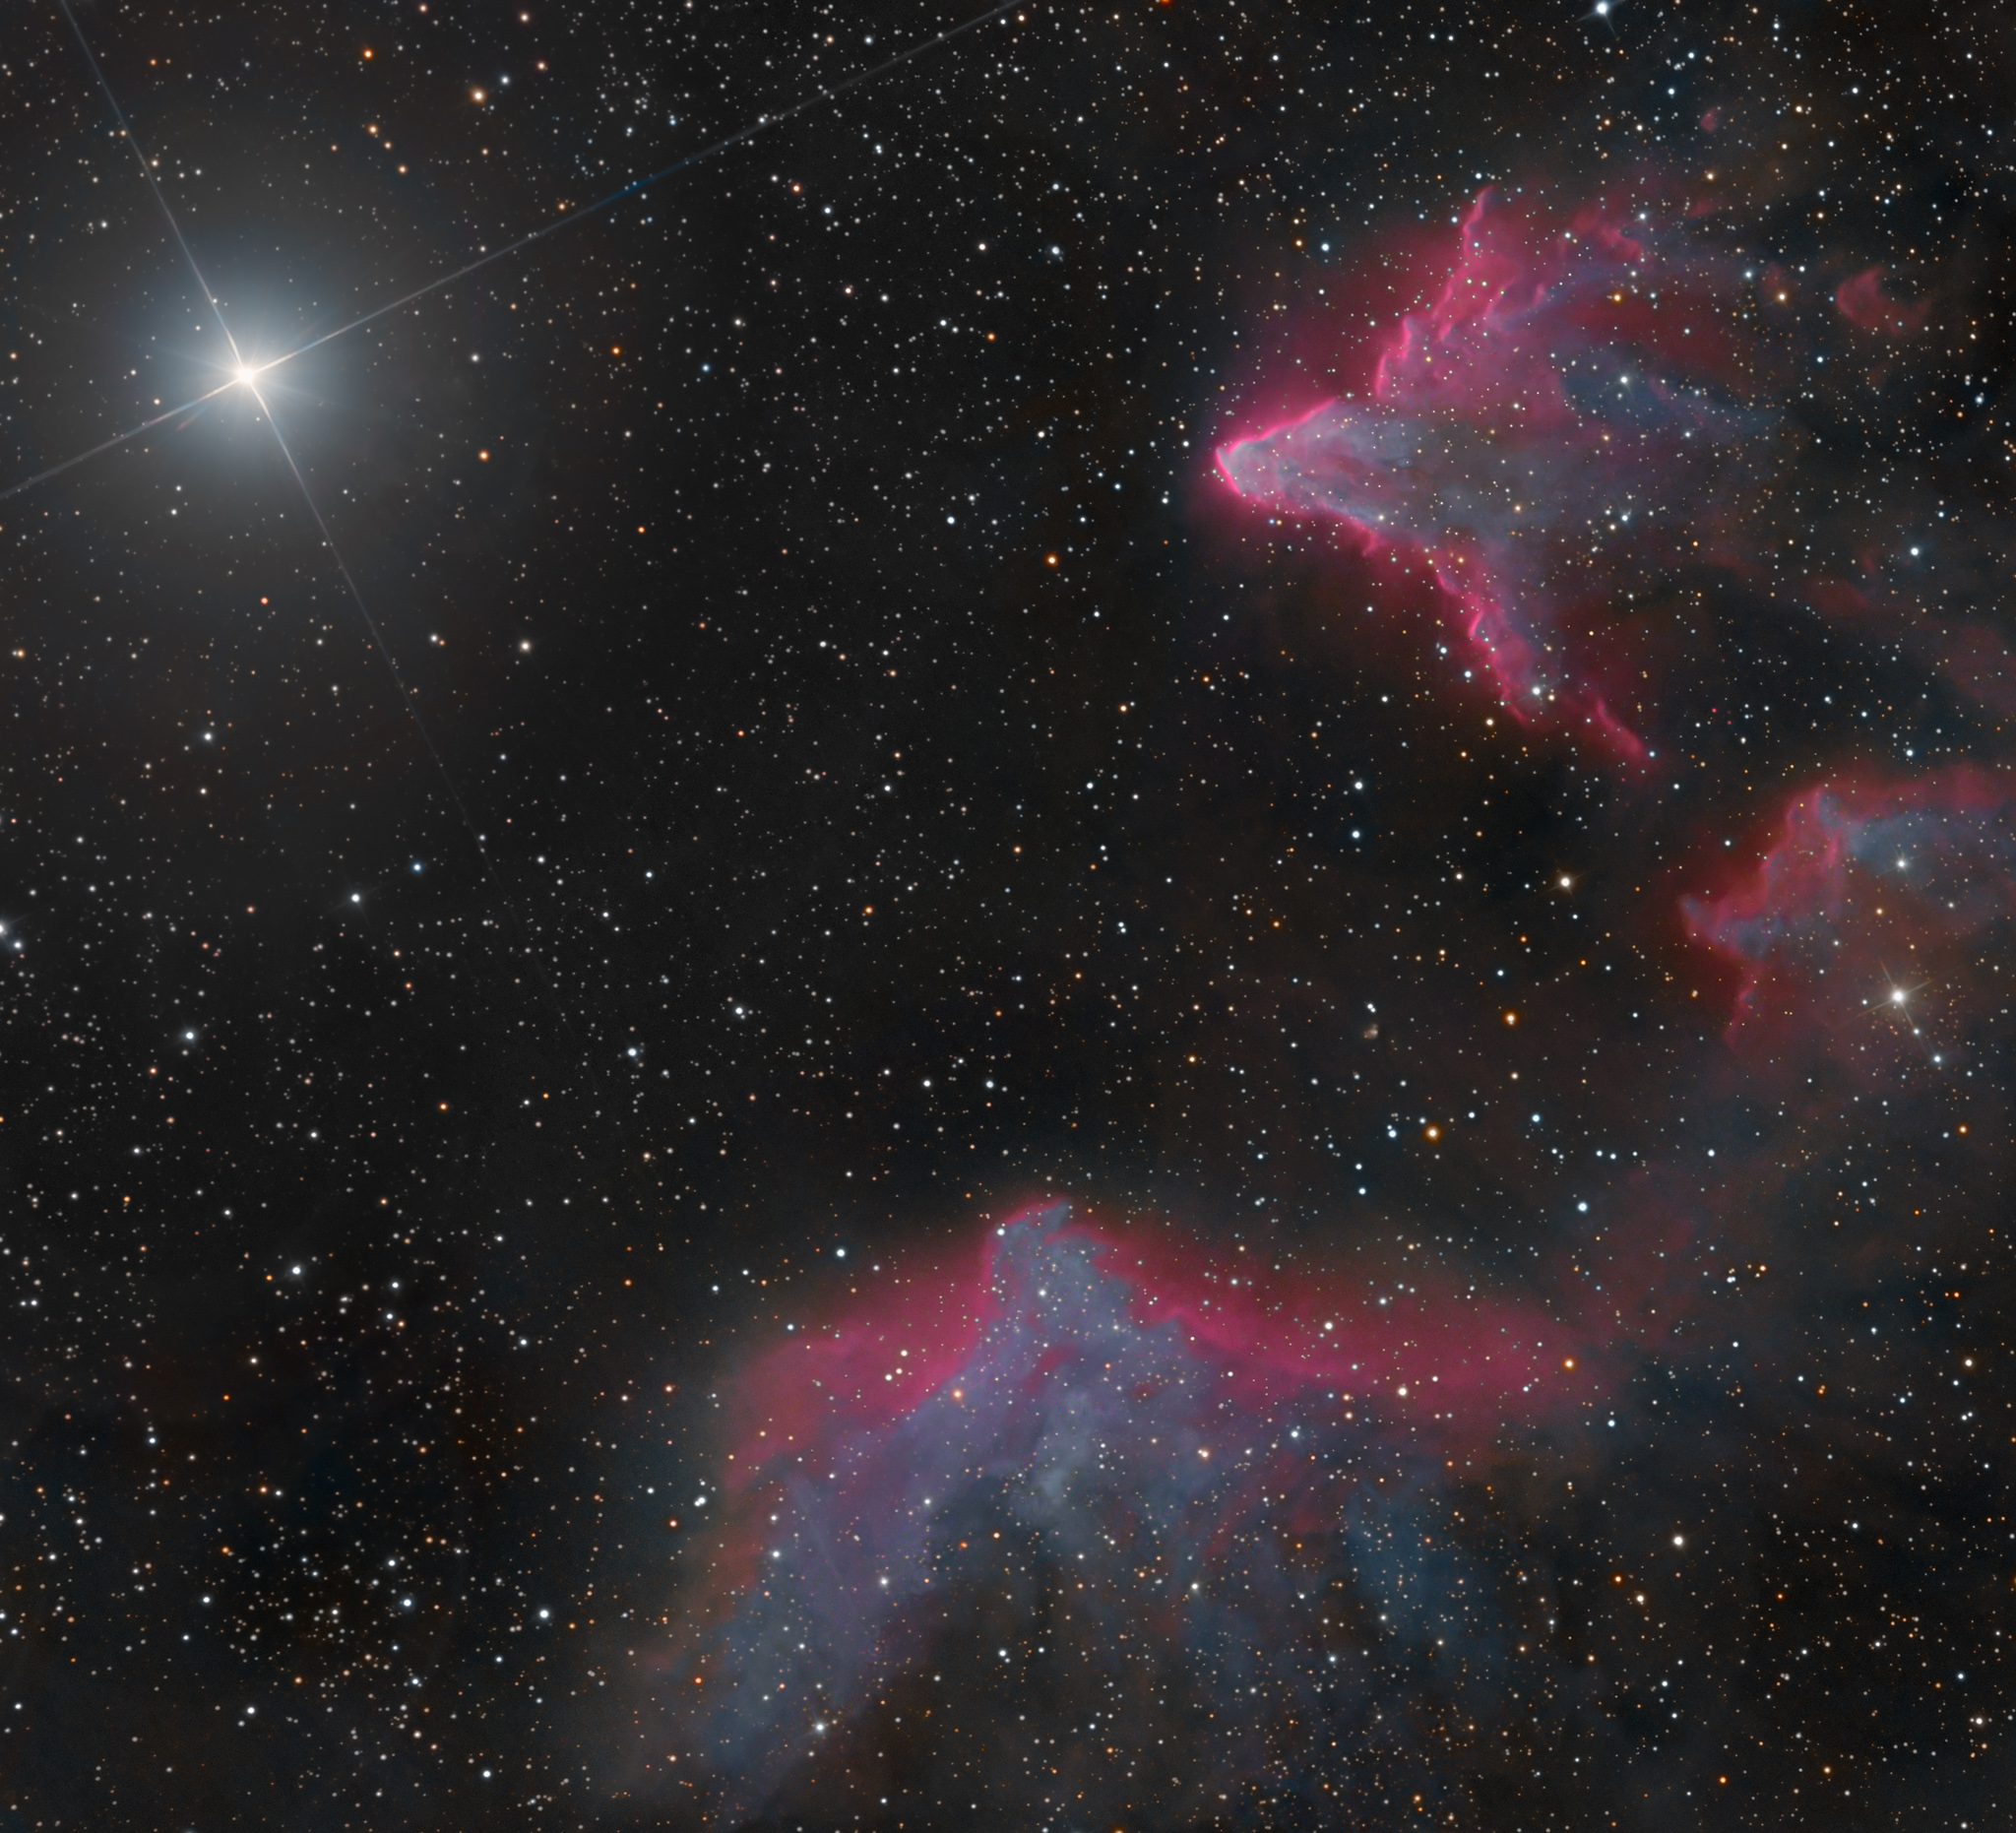 Stargazing Duo Captures Spectacular Nebulas Shining in Cassiopeia (Photo)